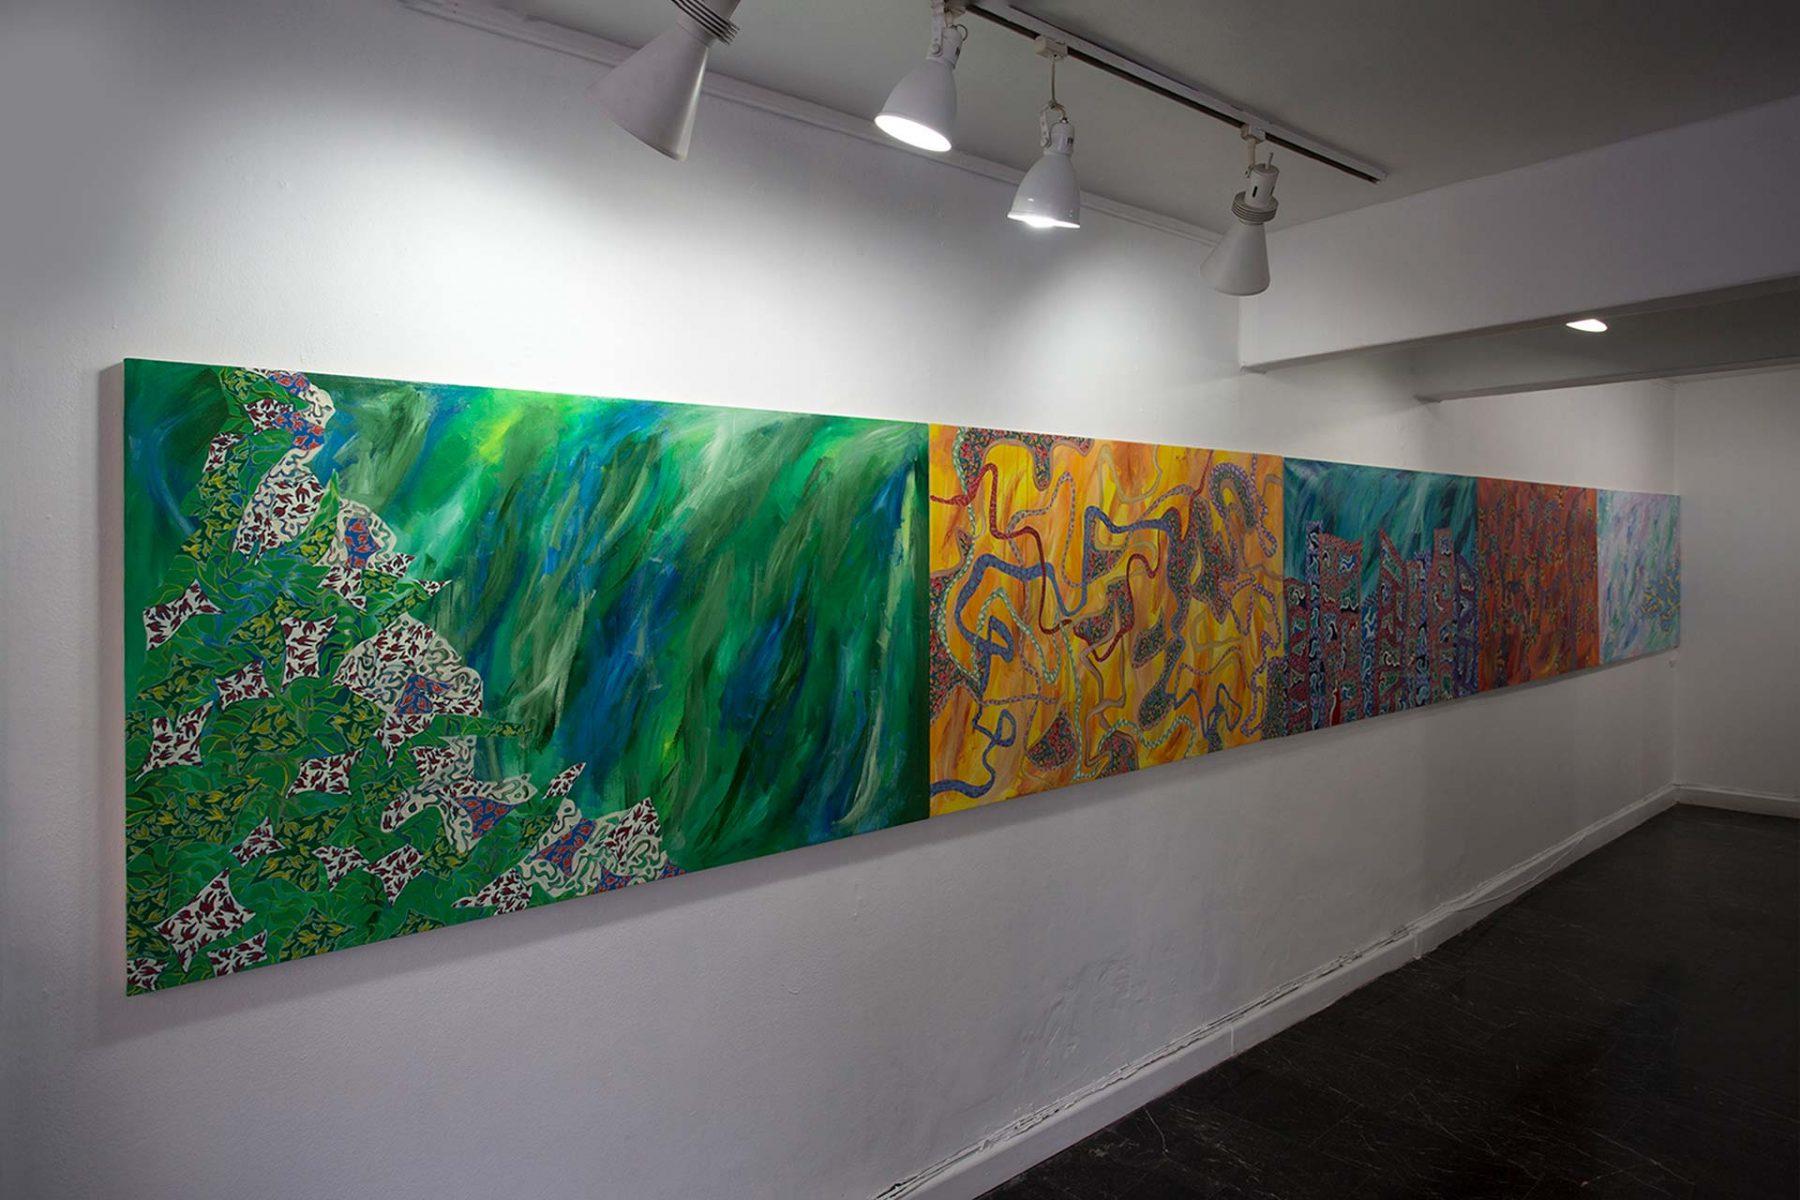 Salaat (Five Seasons) view 1 (2008) acrylic on canvas (5 panels) 0.91H x 7.62W meters